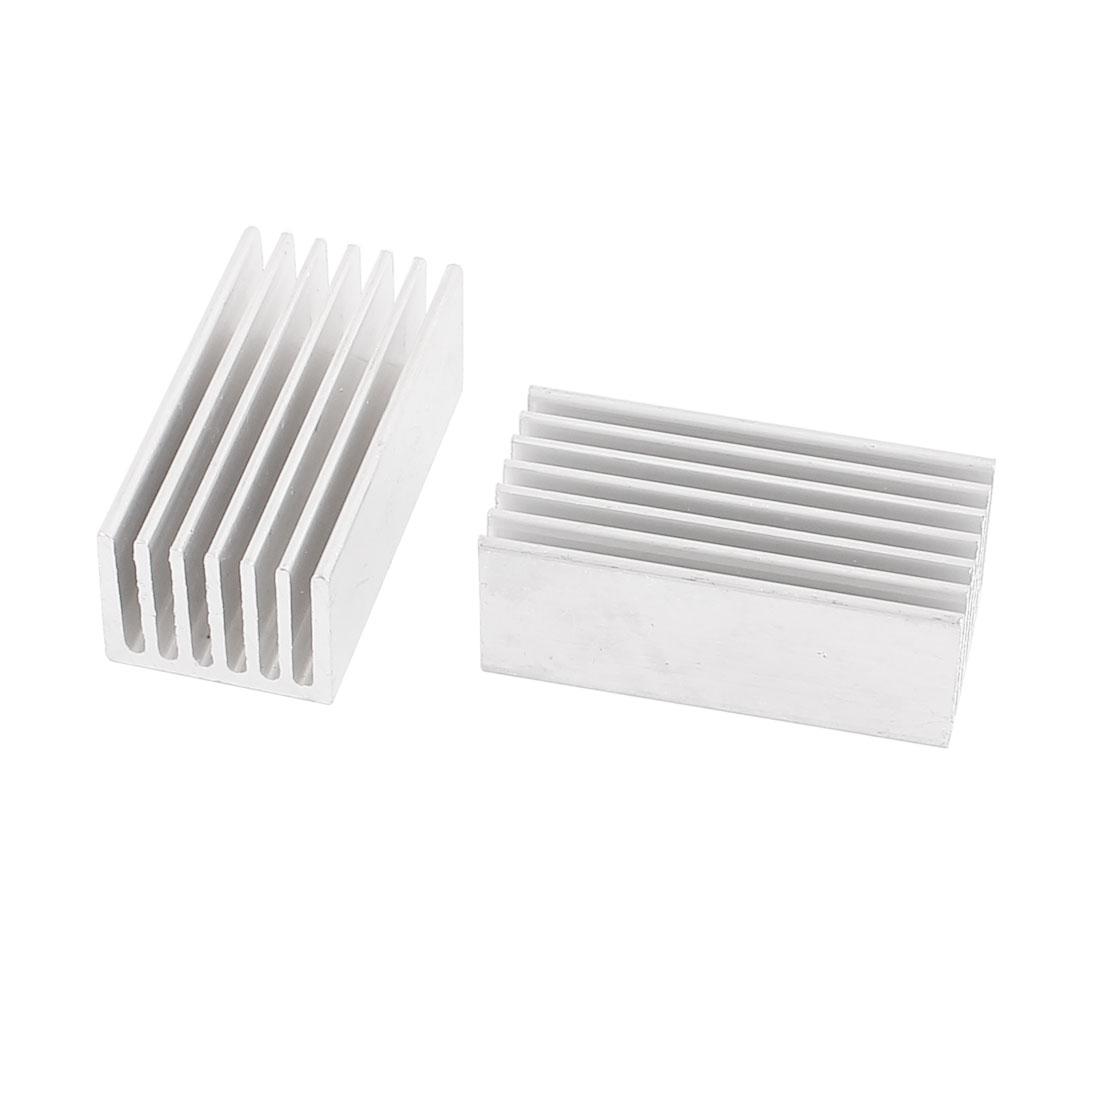 Aluminium Silver Tone 40 x 20 x 15mm IC Heatsink Heat Diffuse Cooling Fin 2 Pcs